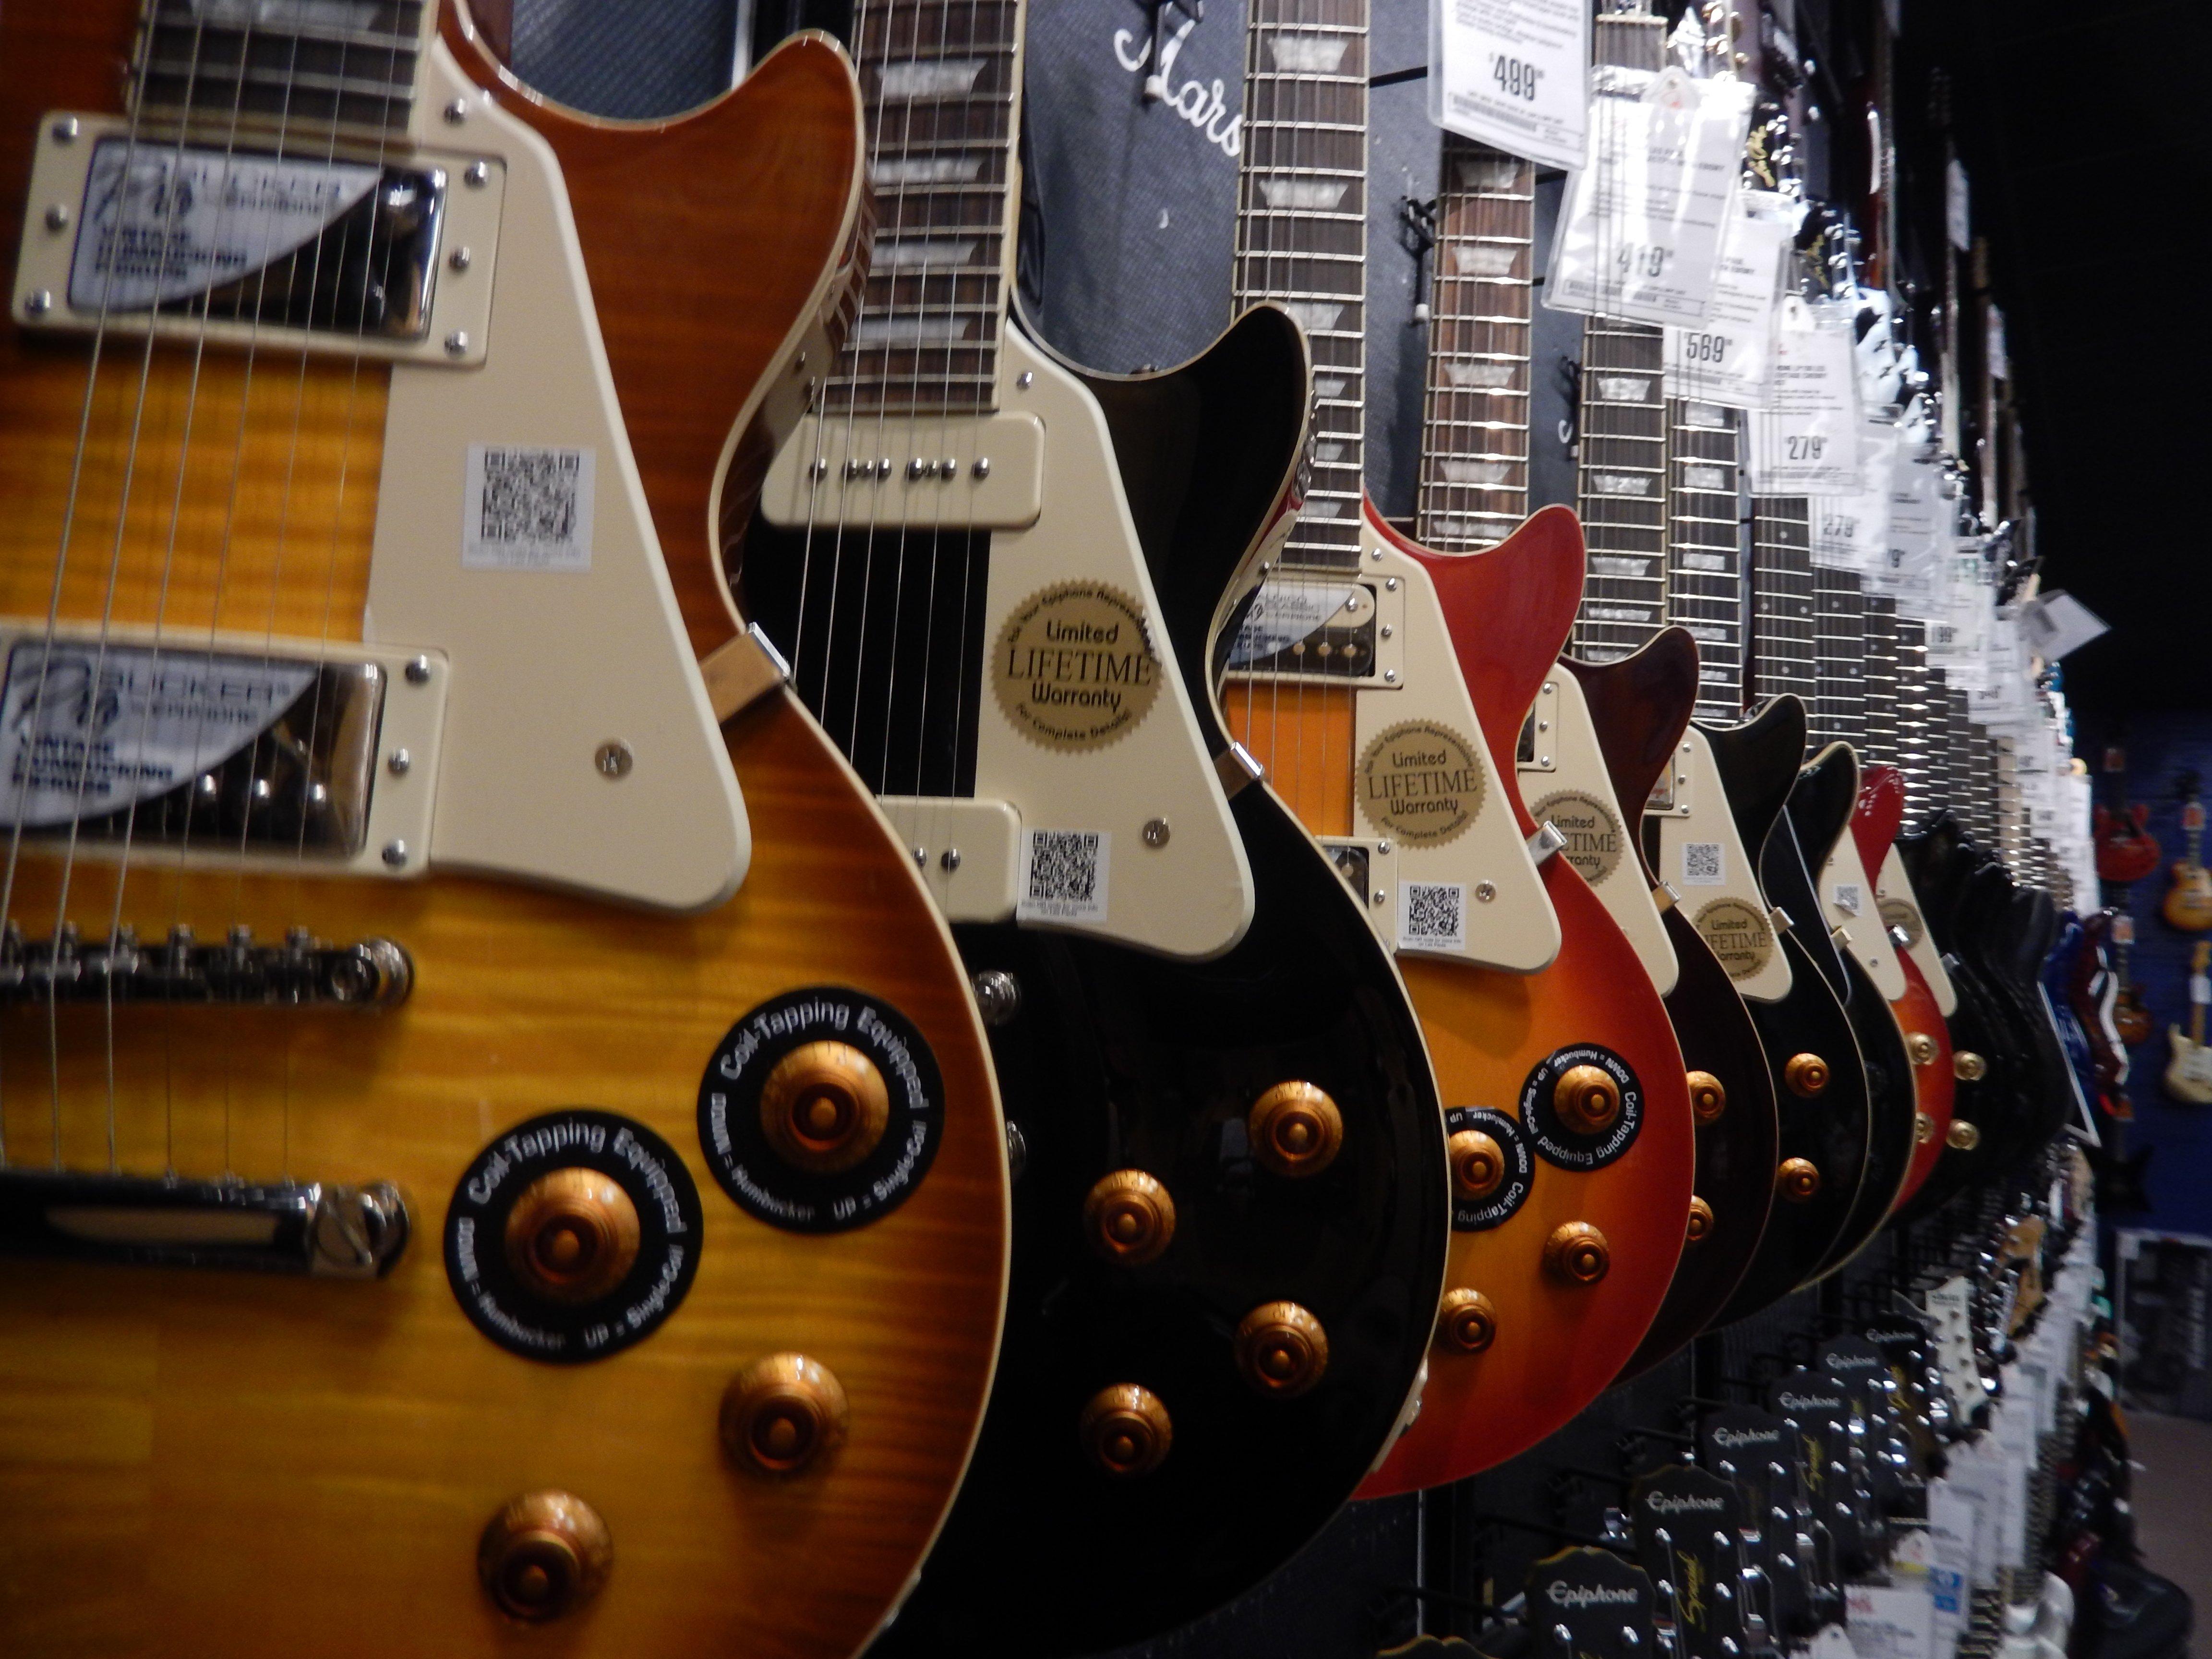 Closeup of walls of guitars of Guitar Center in Cedar Rapids, IA